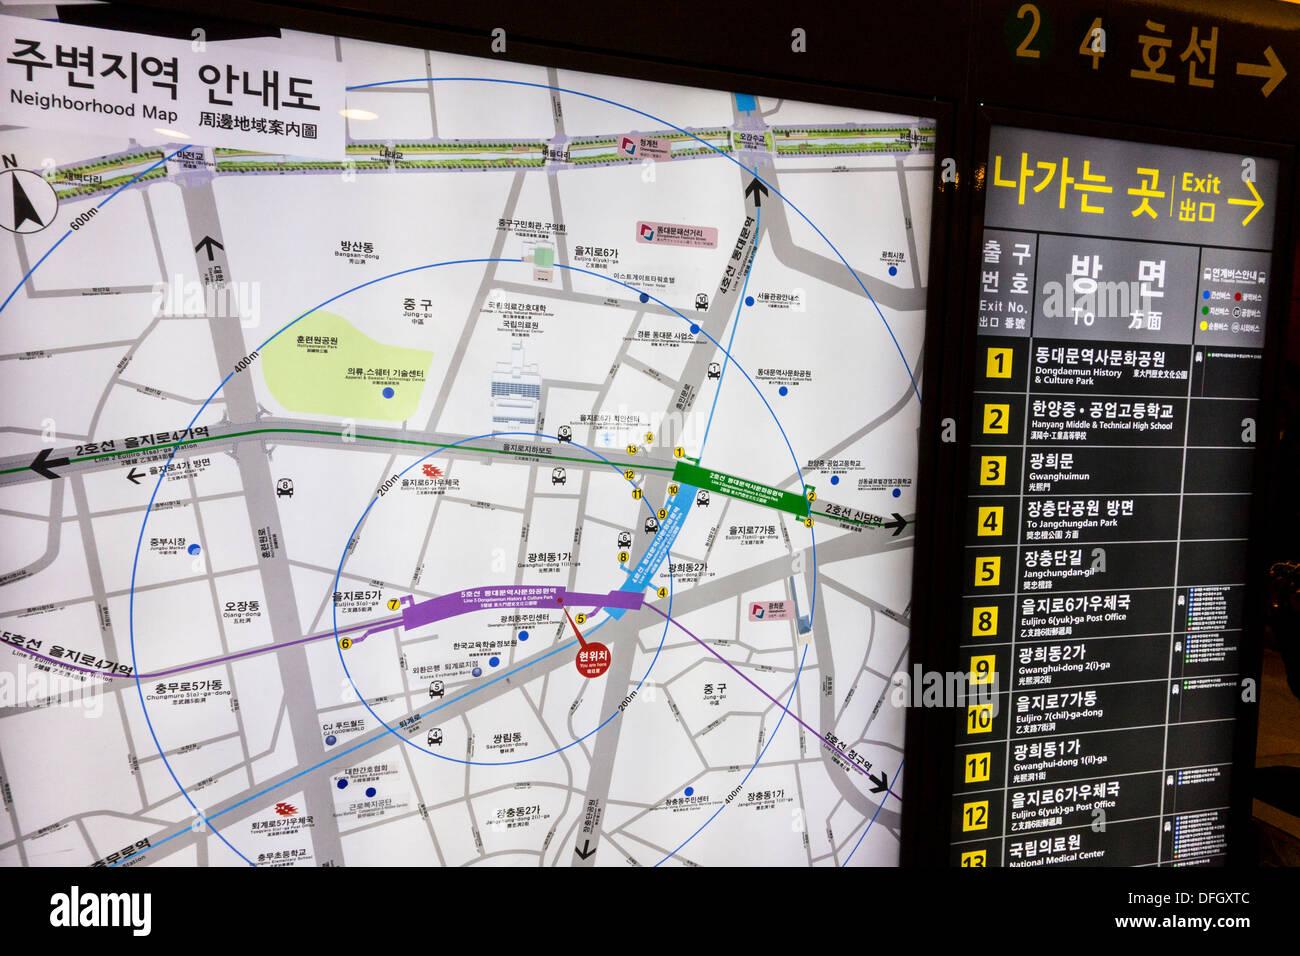 Interactive Digital Map At Subway Station In Seoul Korea Stock